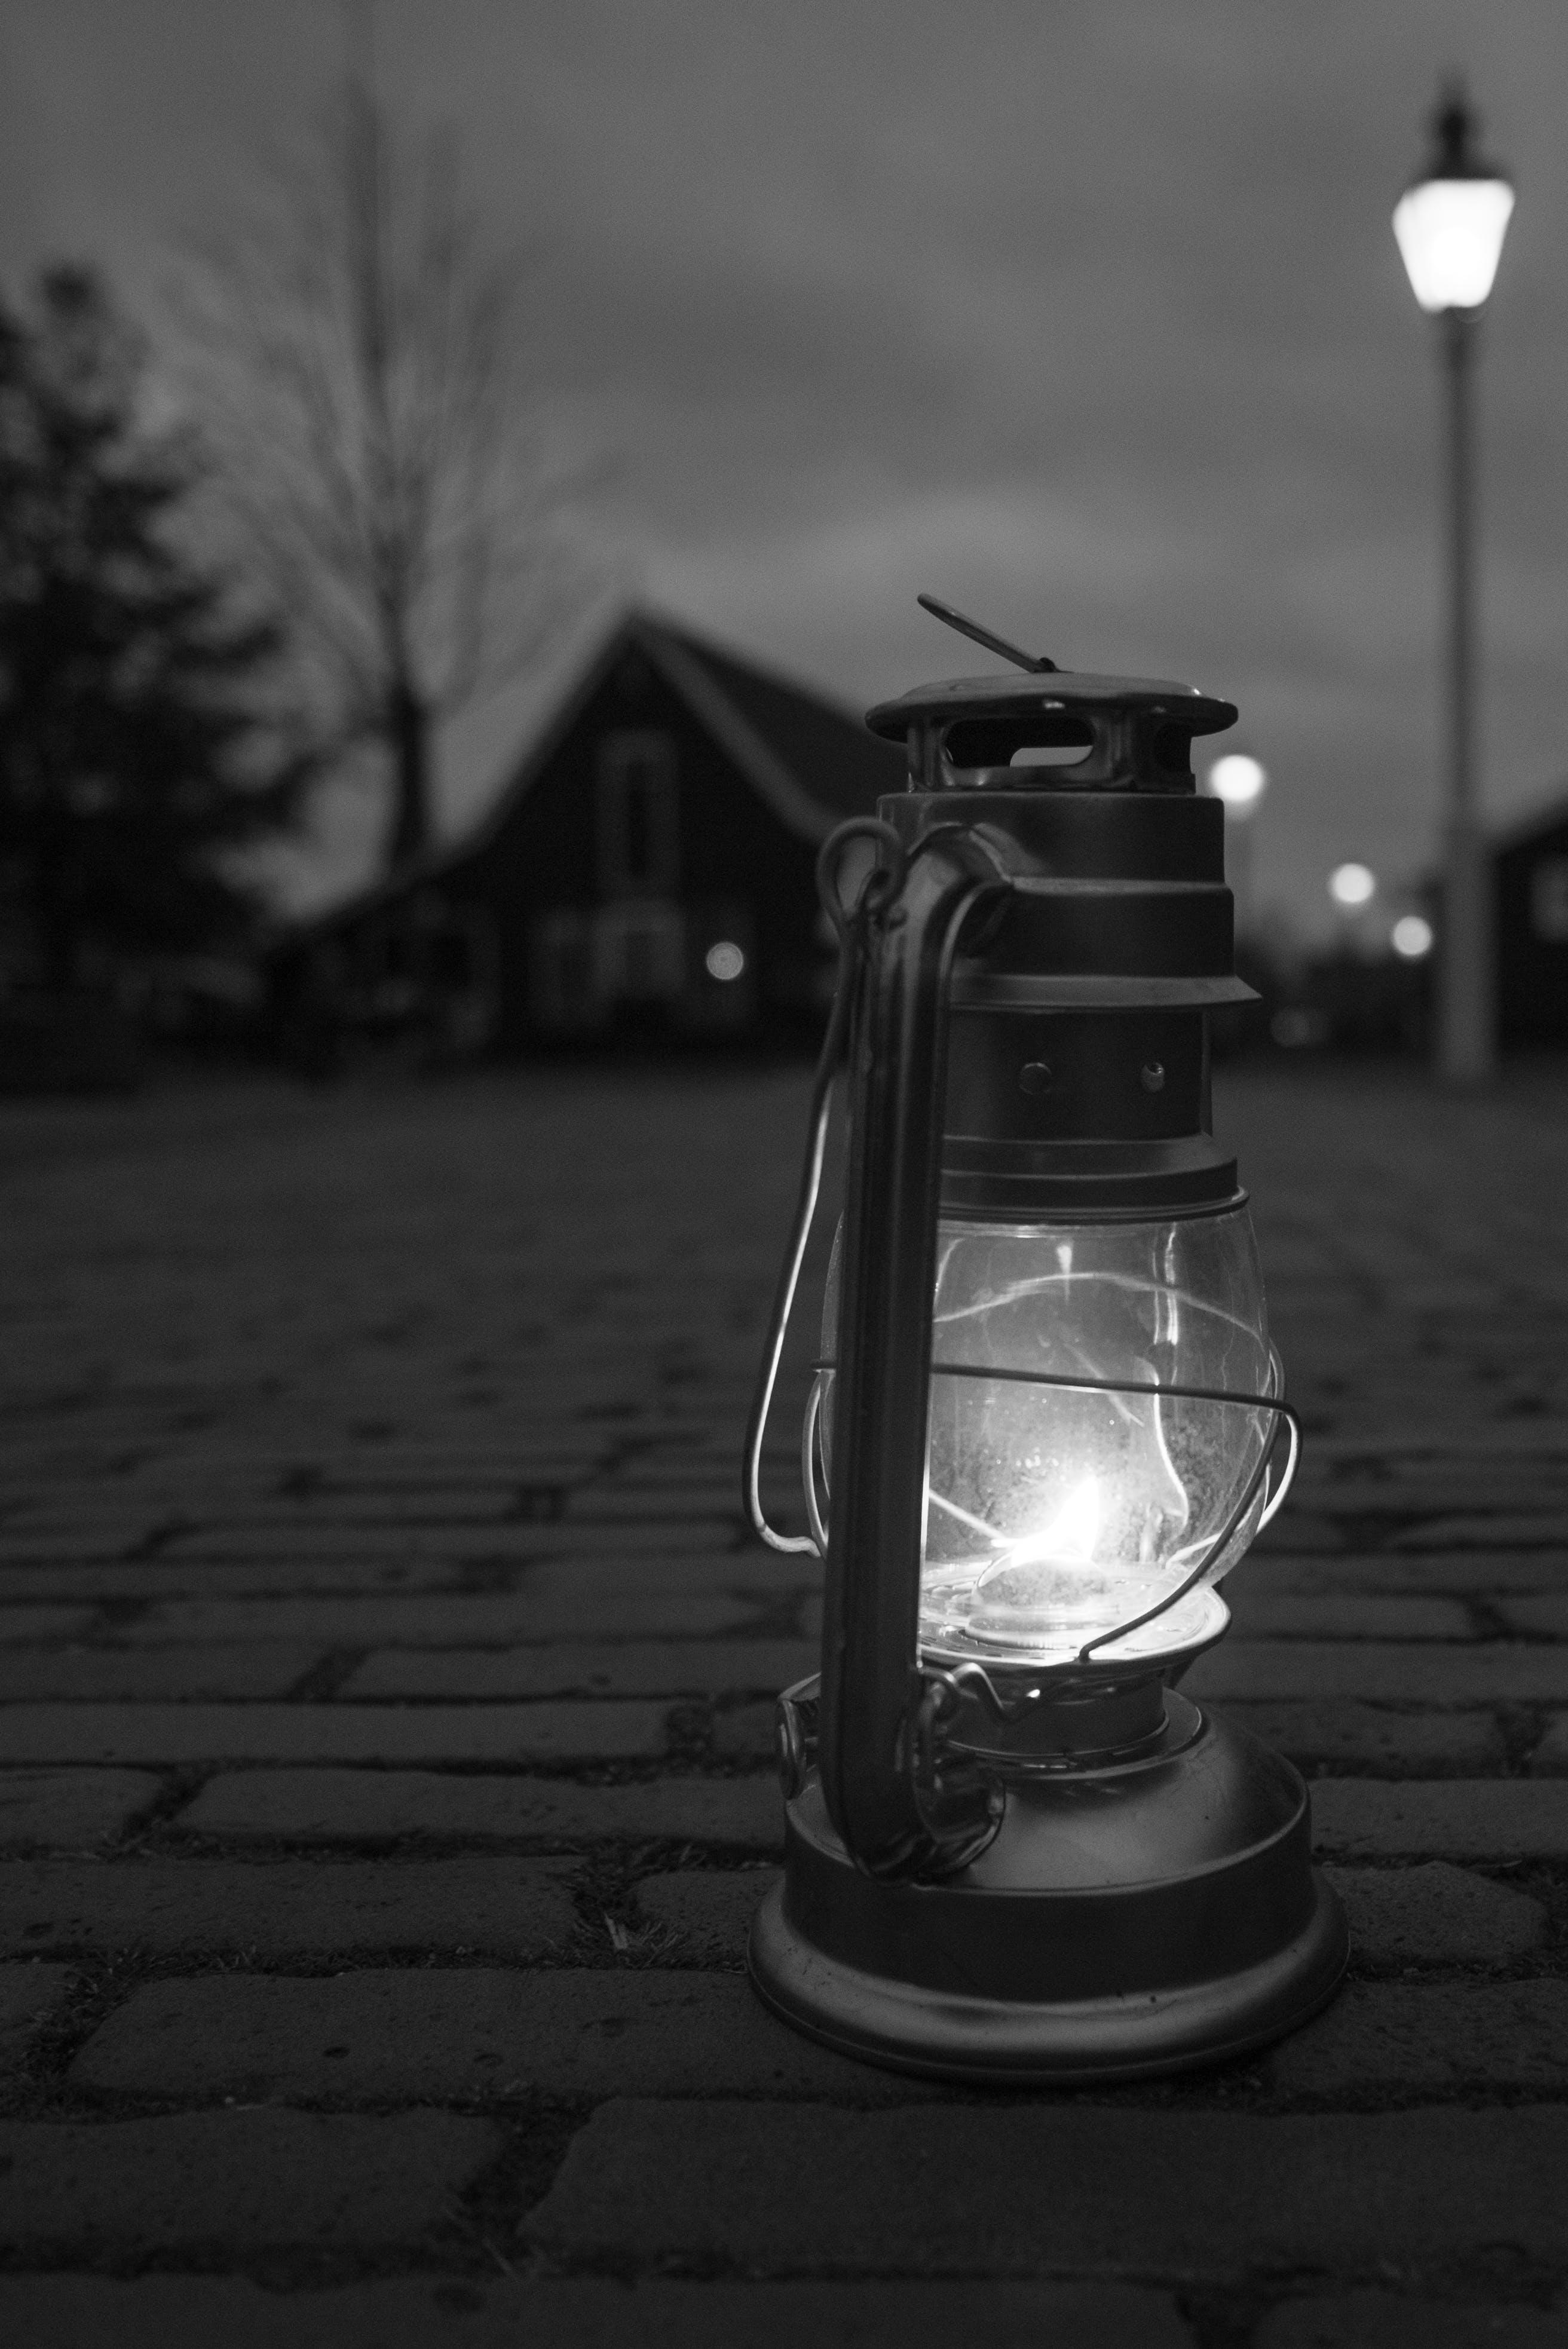 Greyscale Photography Of Lamp On Floor